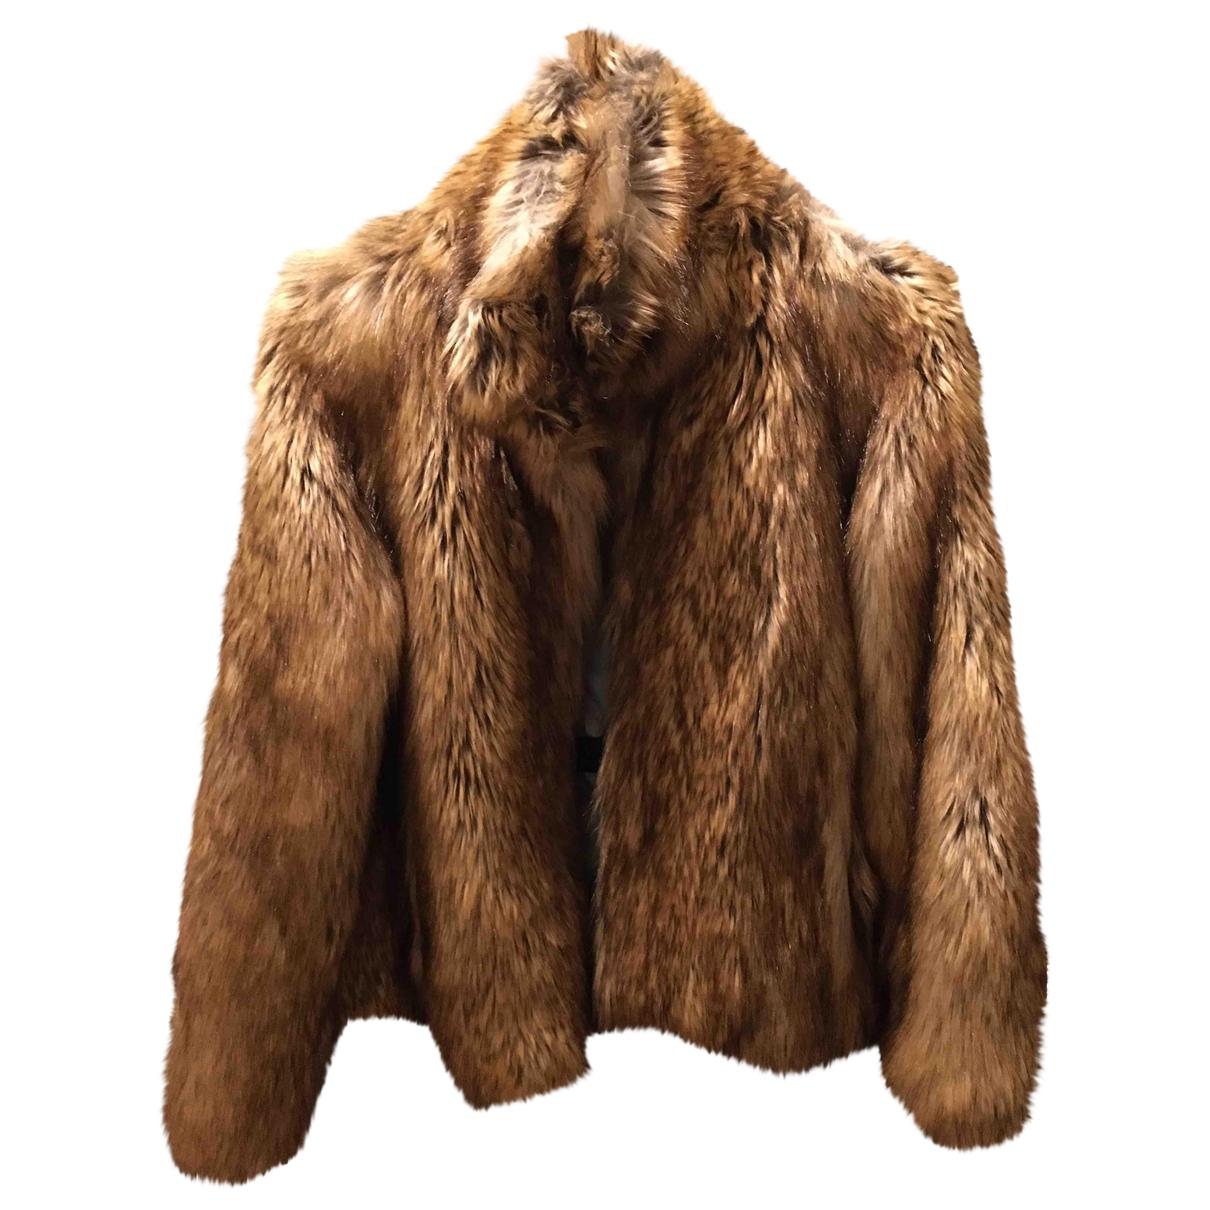 Zadig & Voltaire \N Beige Faux fur jacket for Women 36 FR